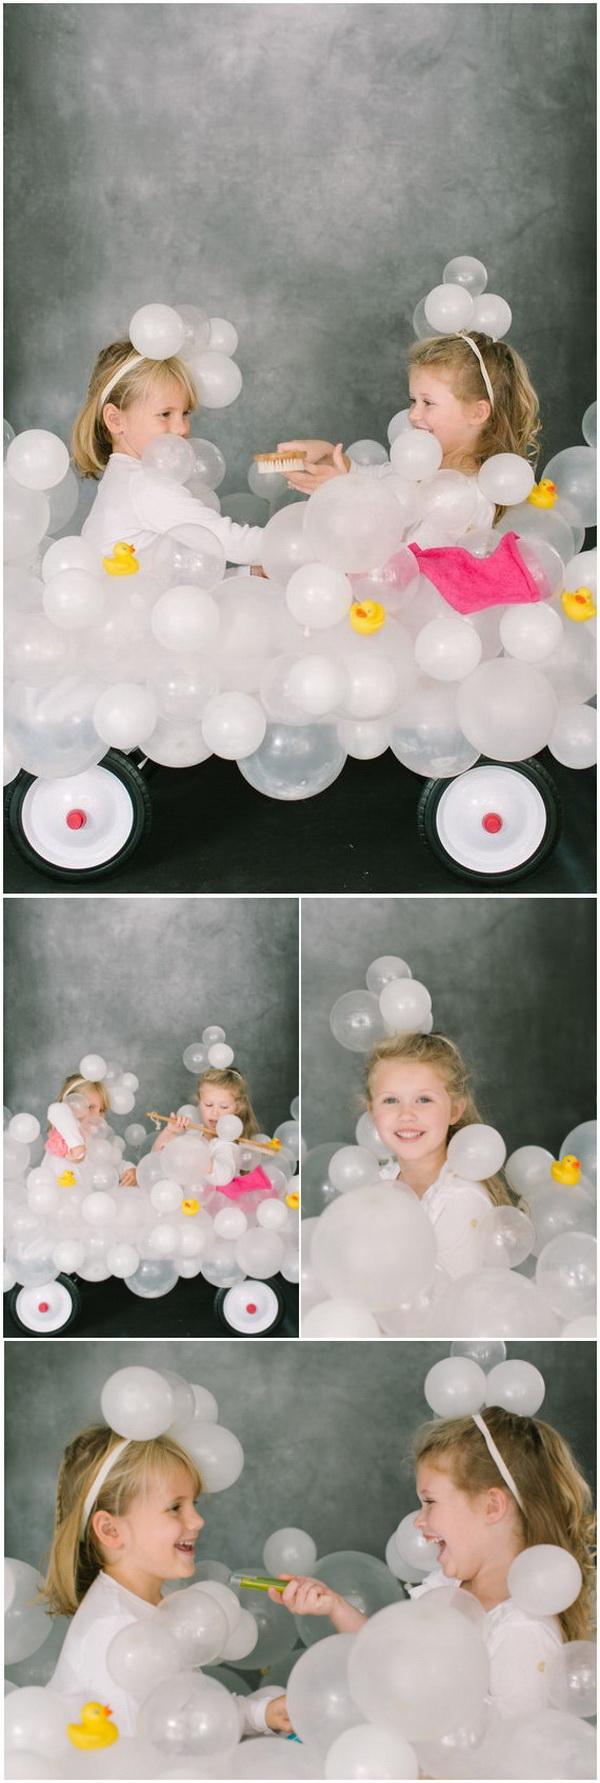 DIY Bubble Bath Halloween Costume.